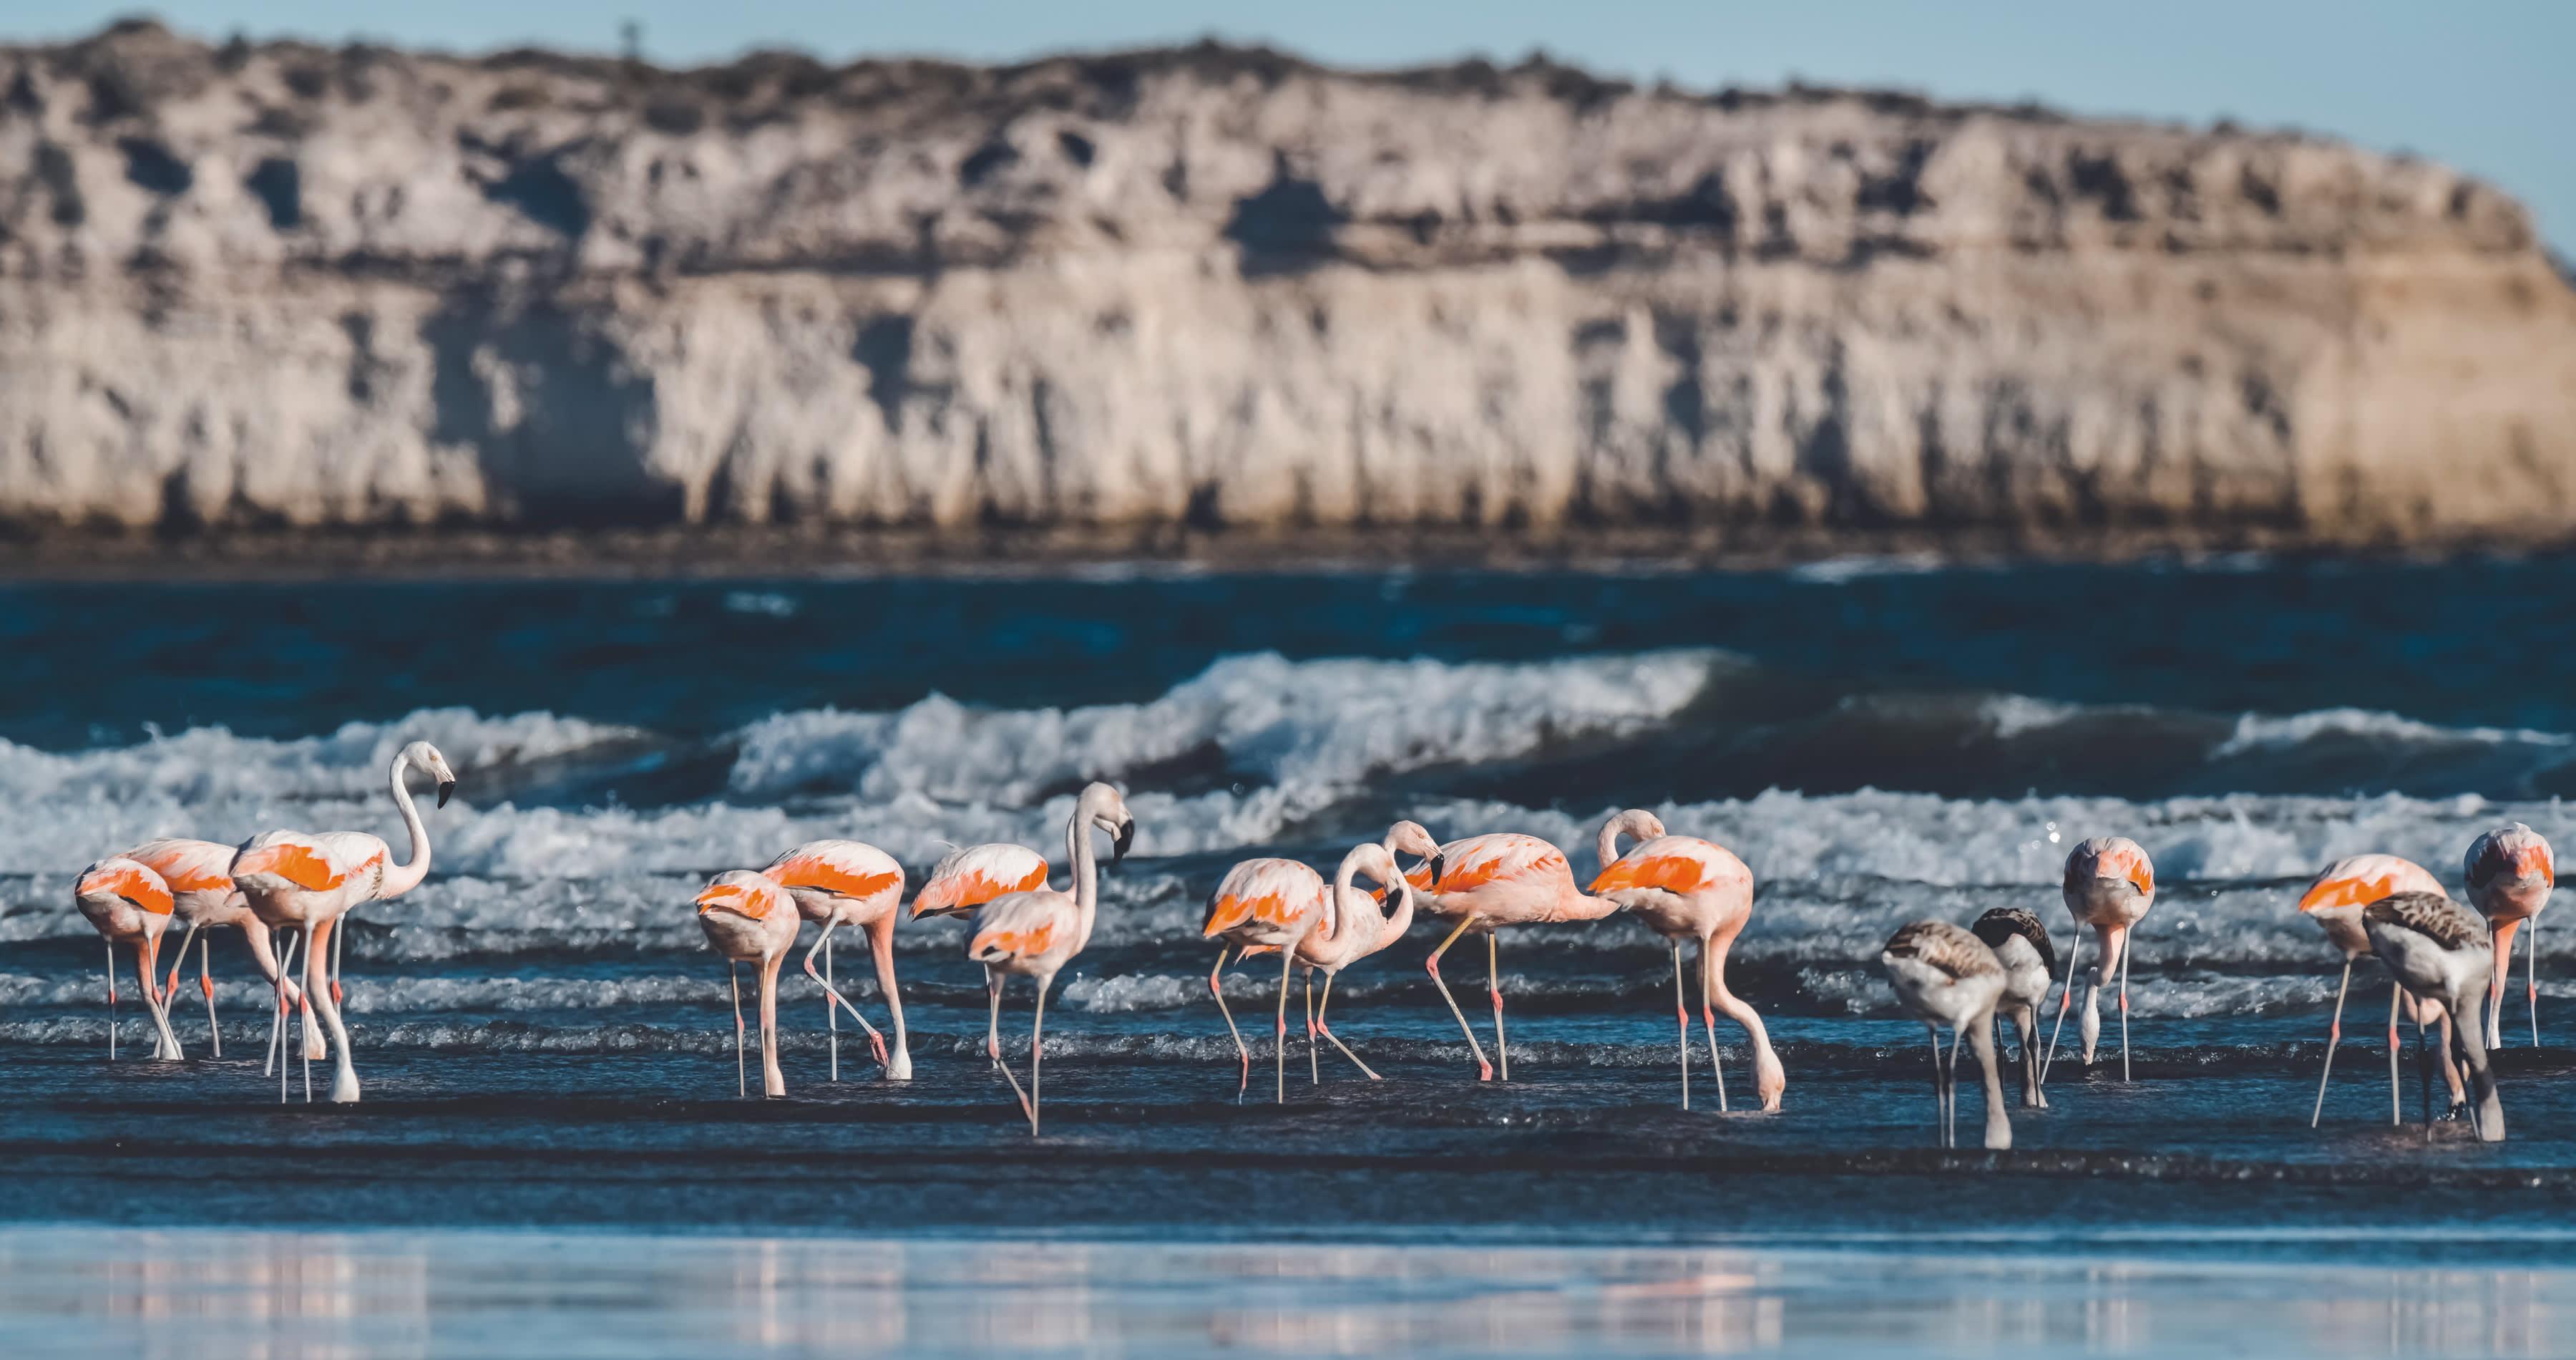 Argentinan flamingos - responsible travel 2021